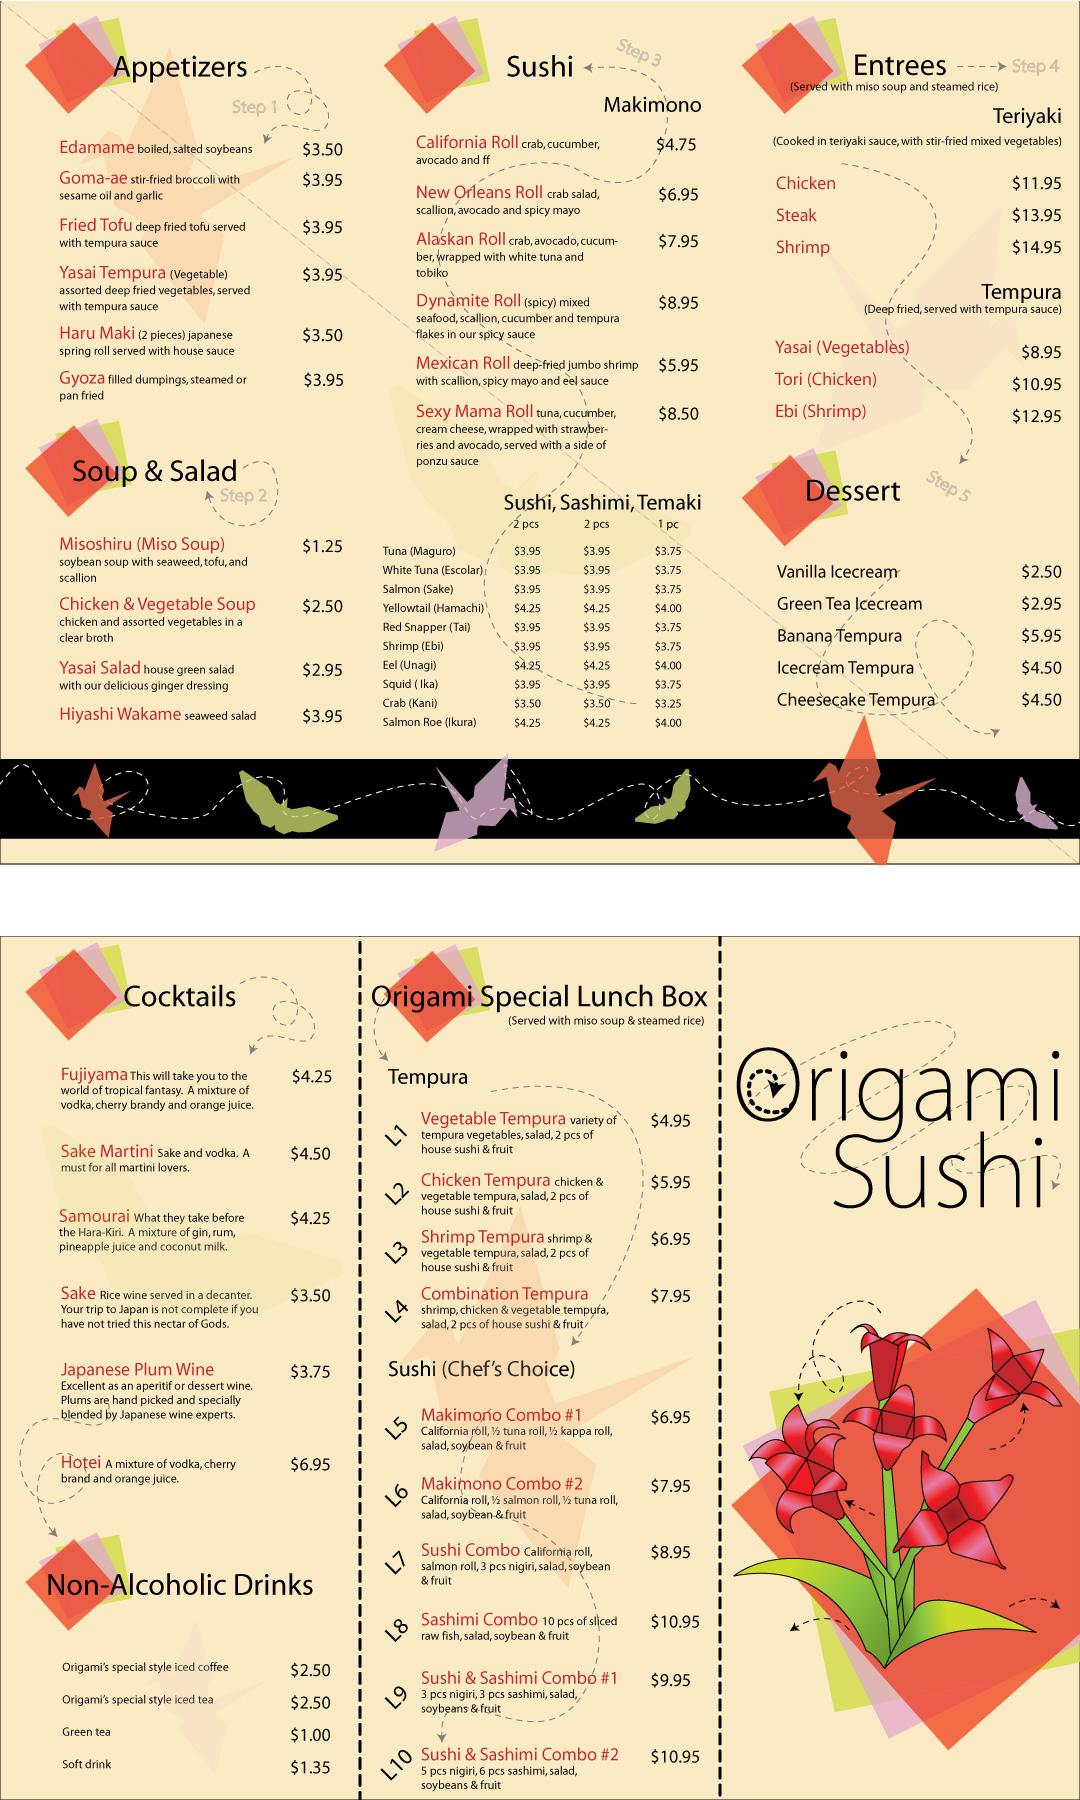 Sushi Origami Origami of Sushi. is simple - YouTube   1800x1080